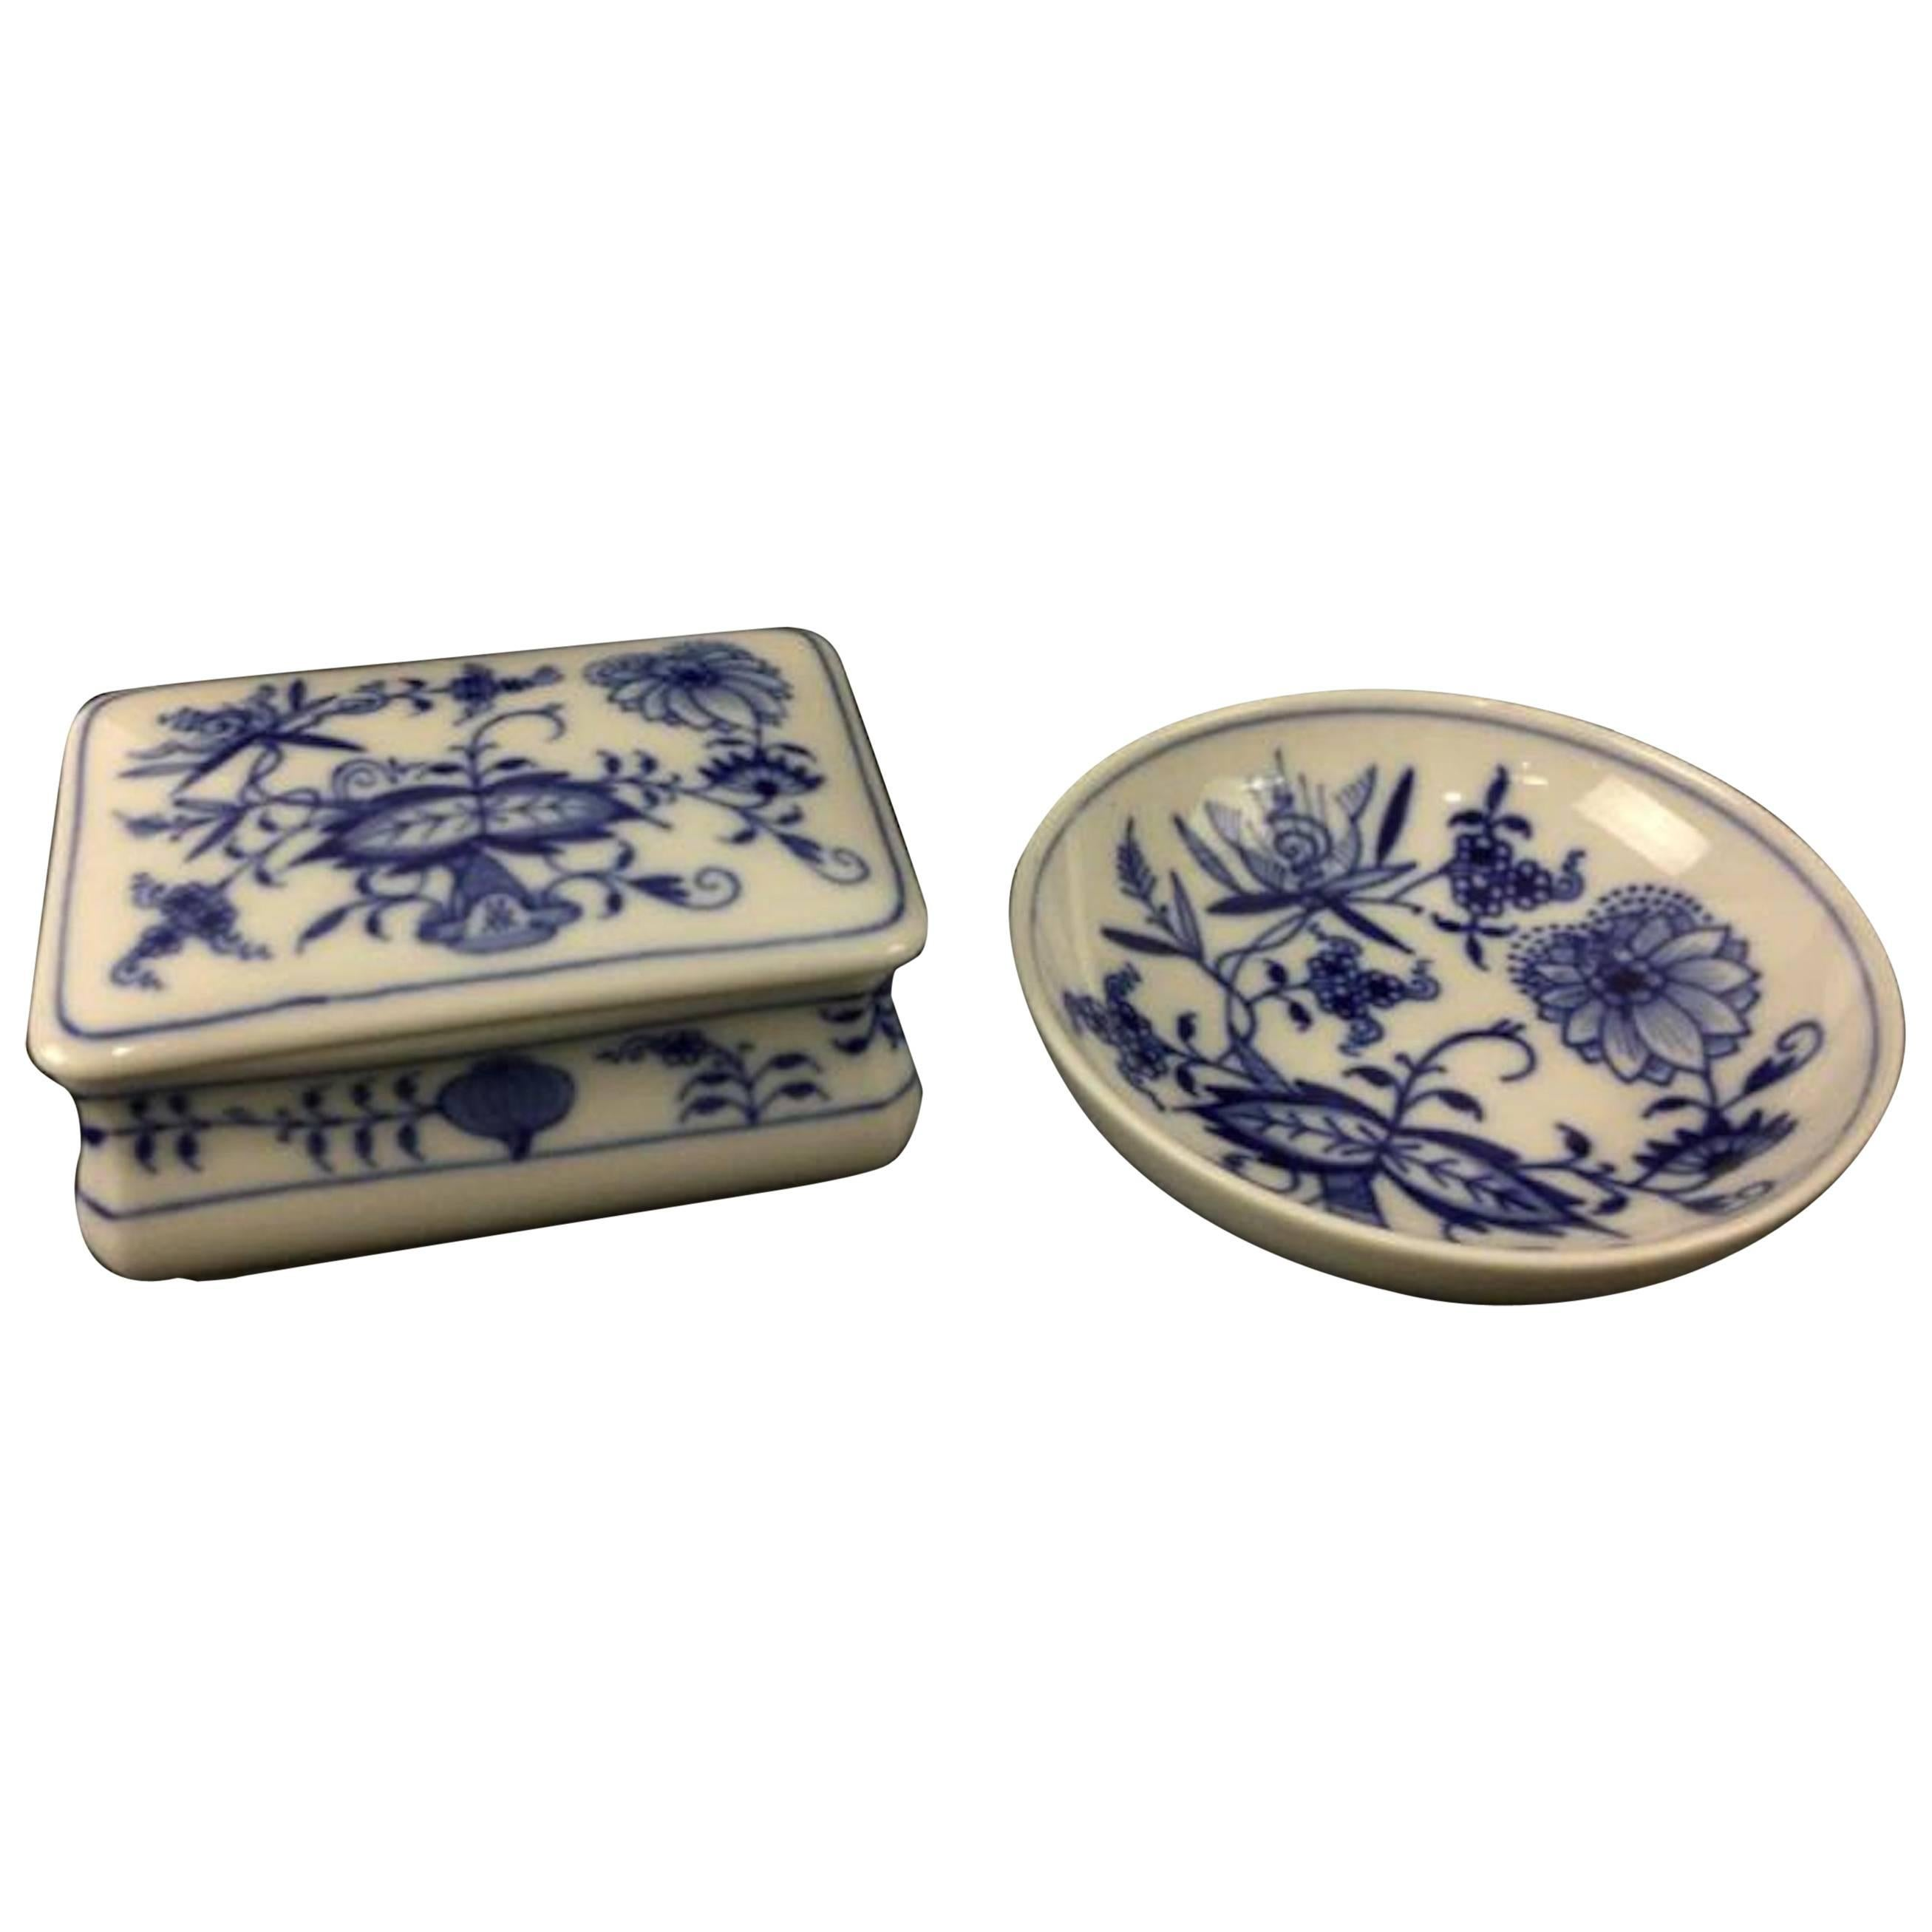 19th Century Meissen Onion Pattern Trinket Box and Dish